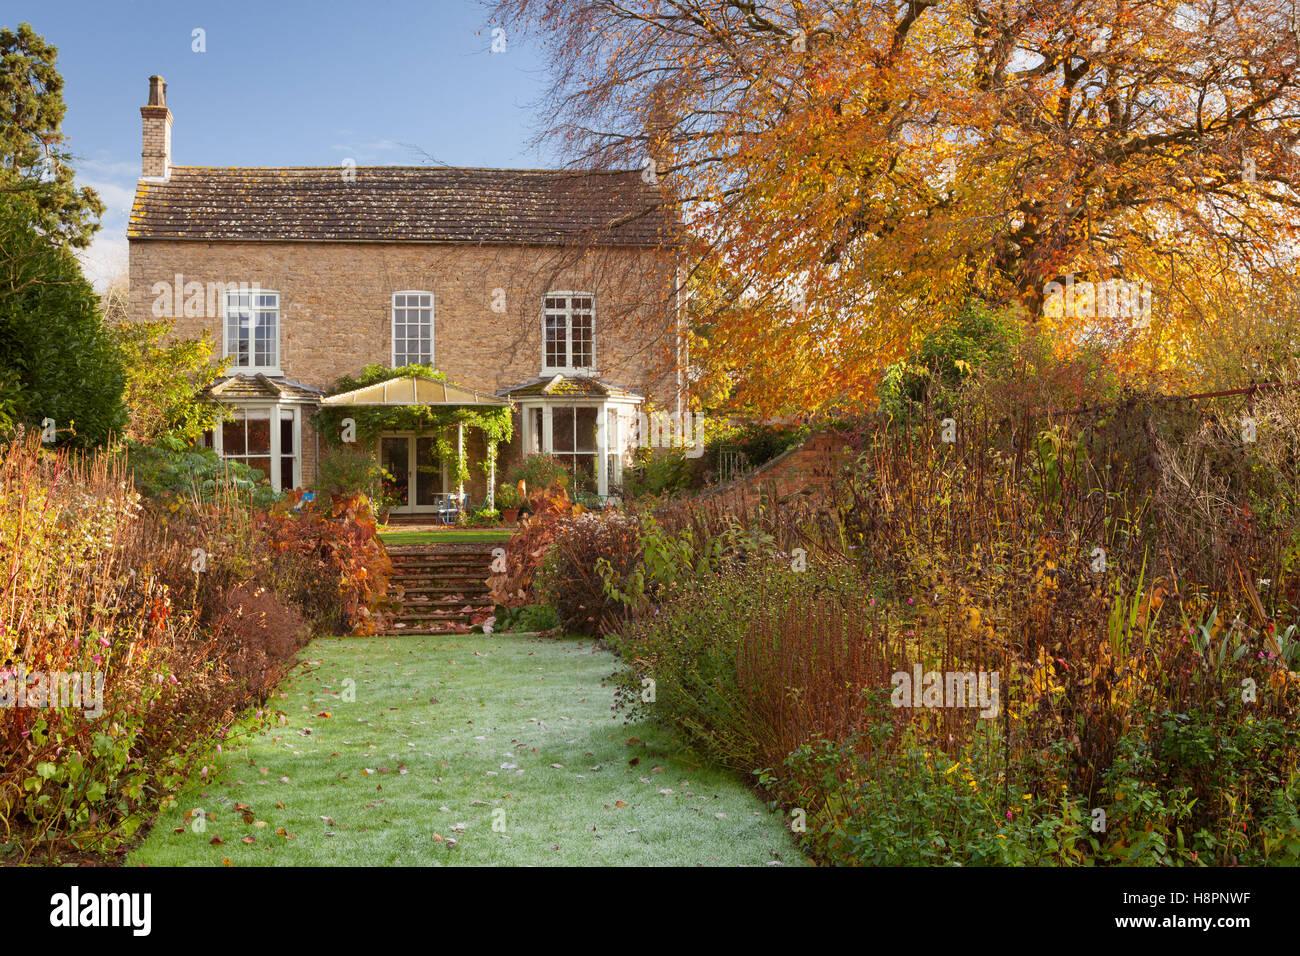 Hall Farm Garden, Harpswell, Lincolnshire, UK. Autumn, November 2016 ...